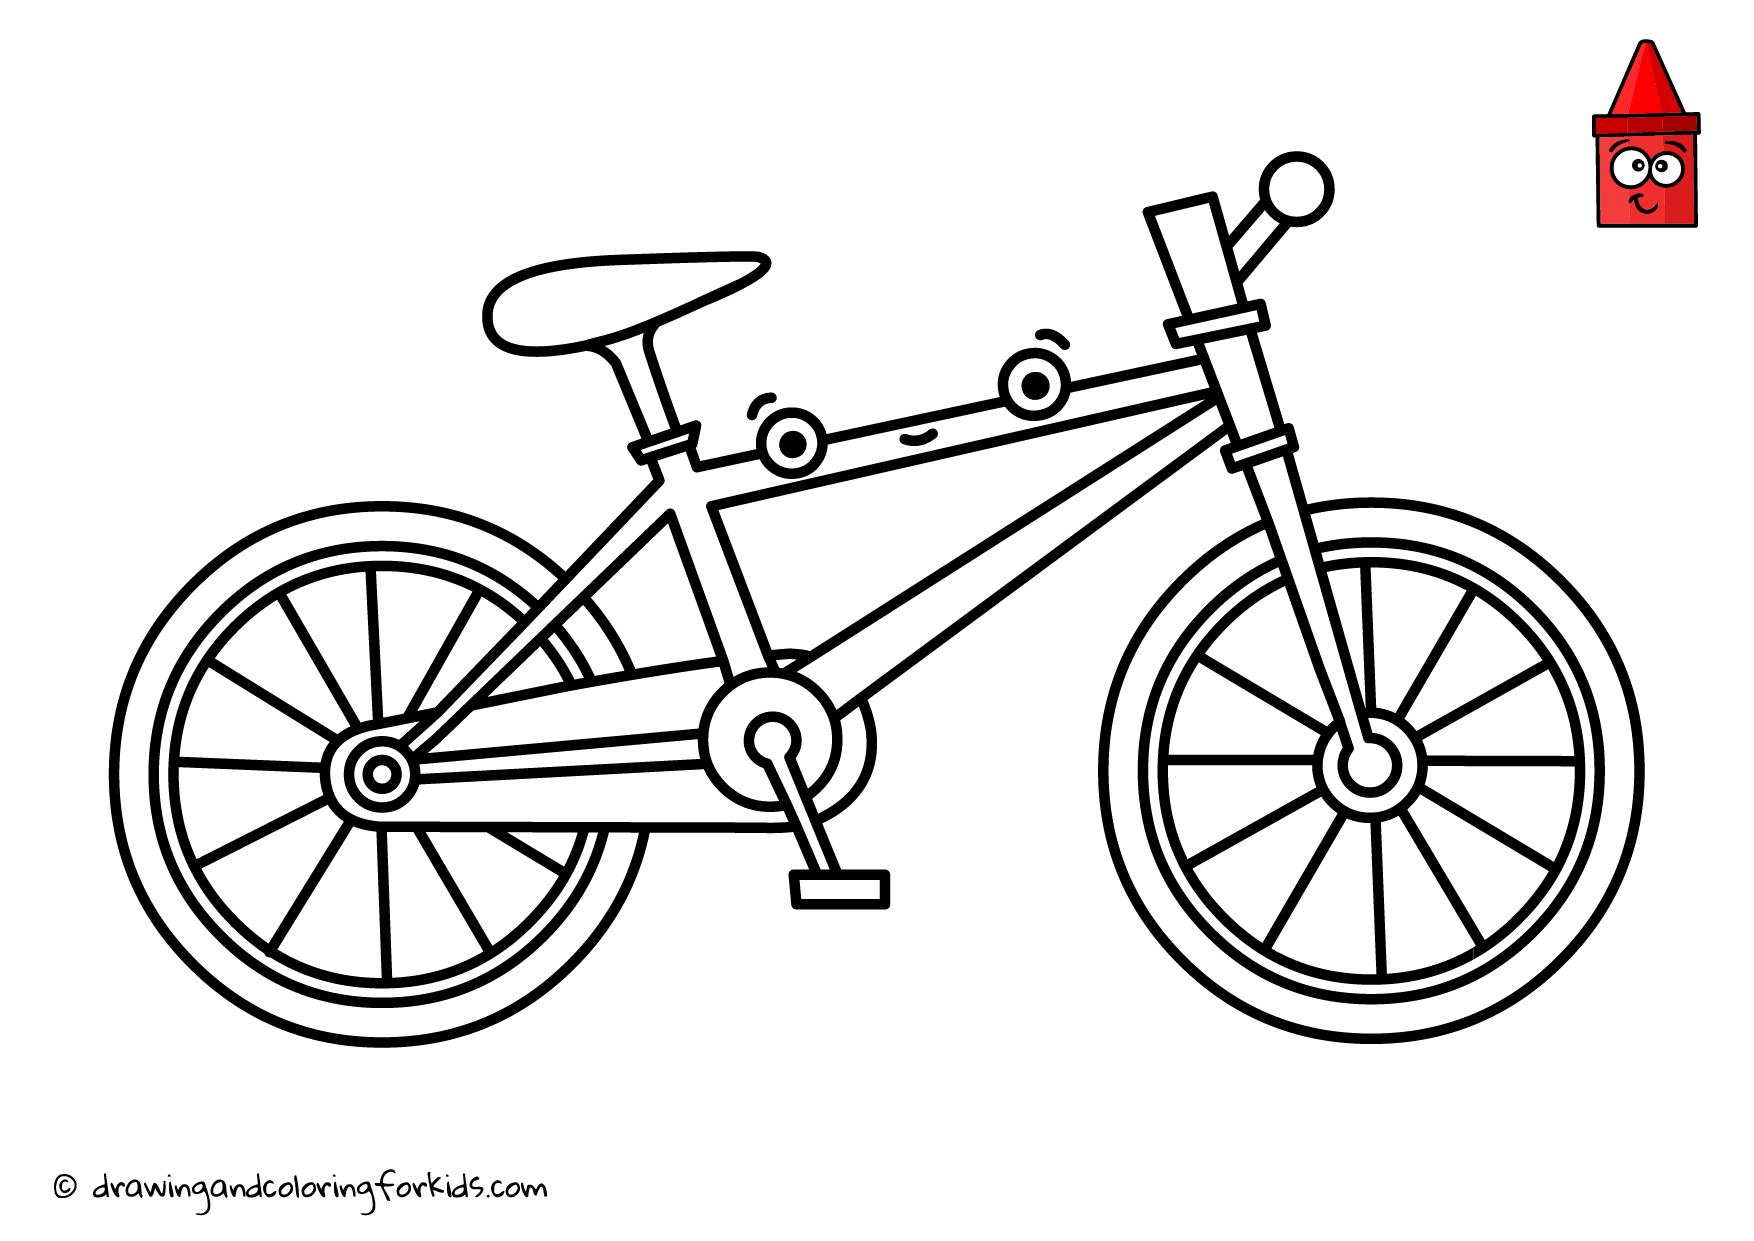 Drawing Bicycle Bike Coloring Page Bicycle Color Bicycle Drawing Step By Step Bicycle Drawing Coloring Pages Coloring Pages For Kids